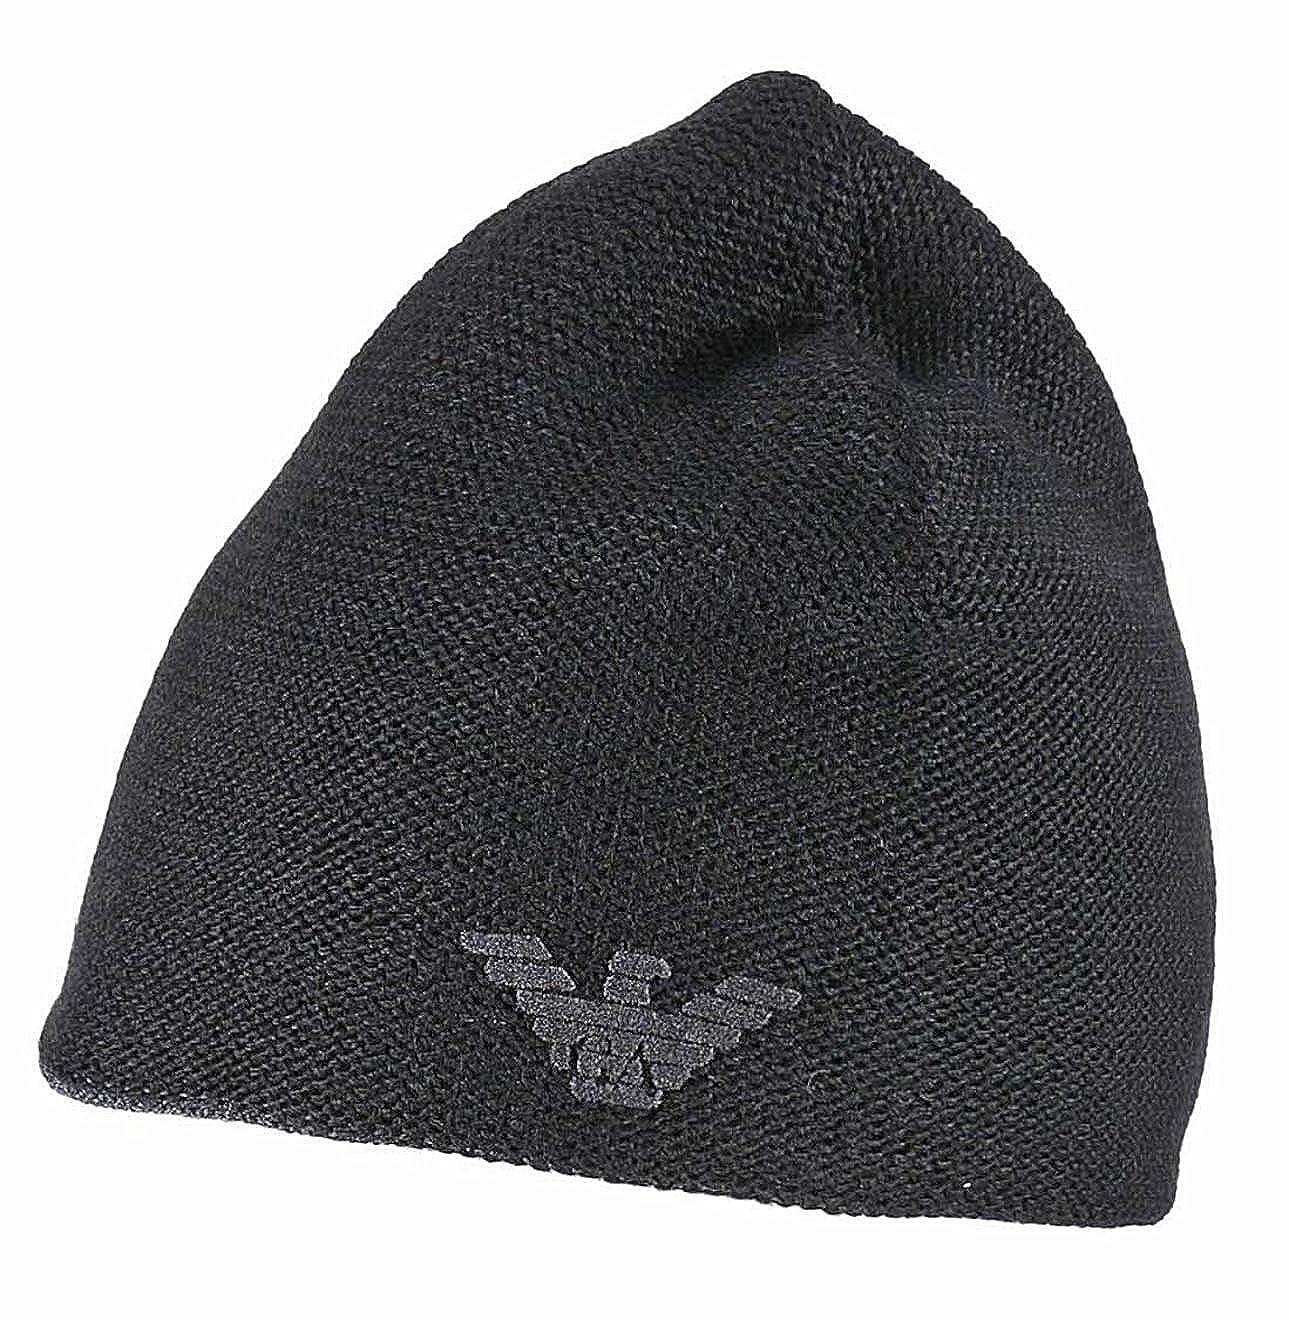 b045e0e7eb1 Emporio Armani 627815 Mens Reversible Wool Mix Beanie (Black) at Amazon  Men s Clothing store